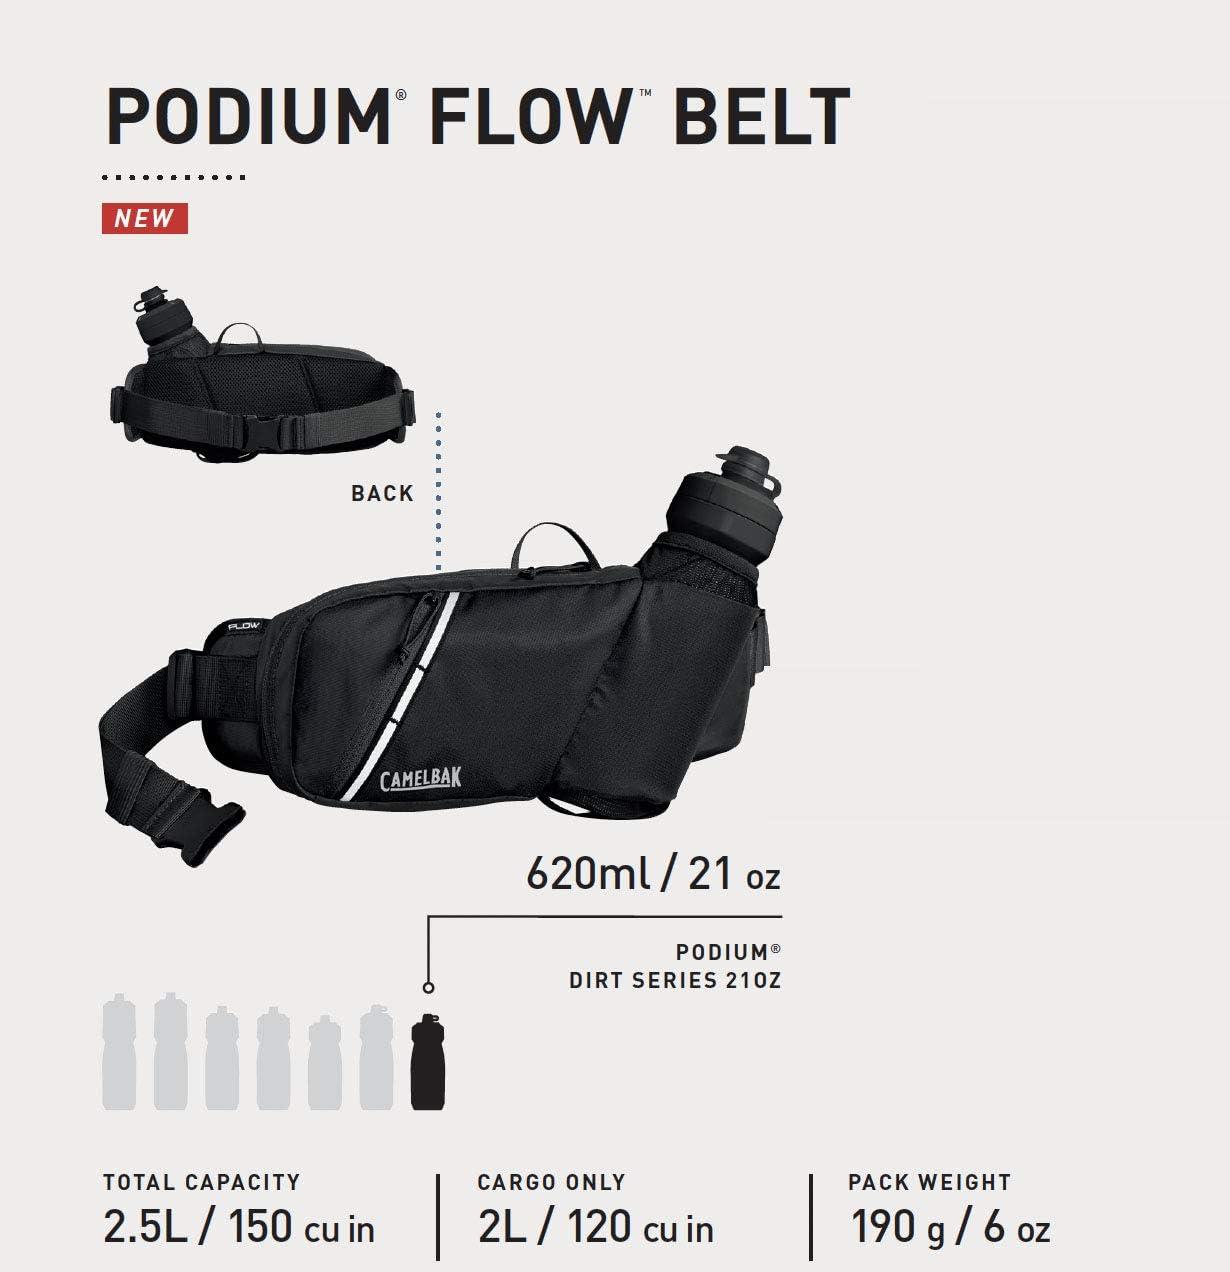 CamelBak Podium Flow Bike Hydration Belt Riding Belt 21 Ounce Adjustable Waist Buckle Podium Dirt Series Bottle Secure Zipper Pocket Easy Access Bottle Pocket